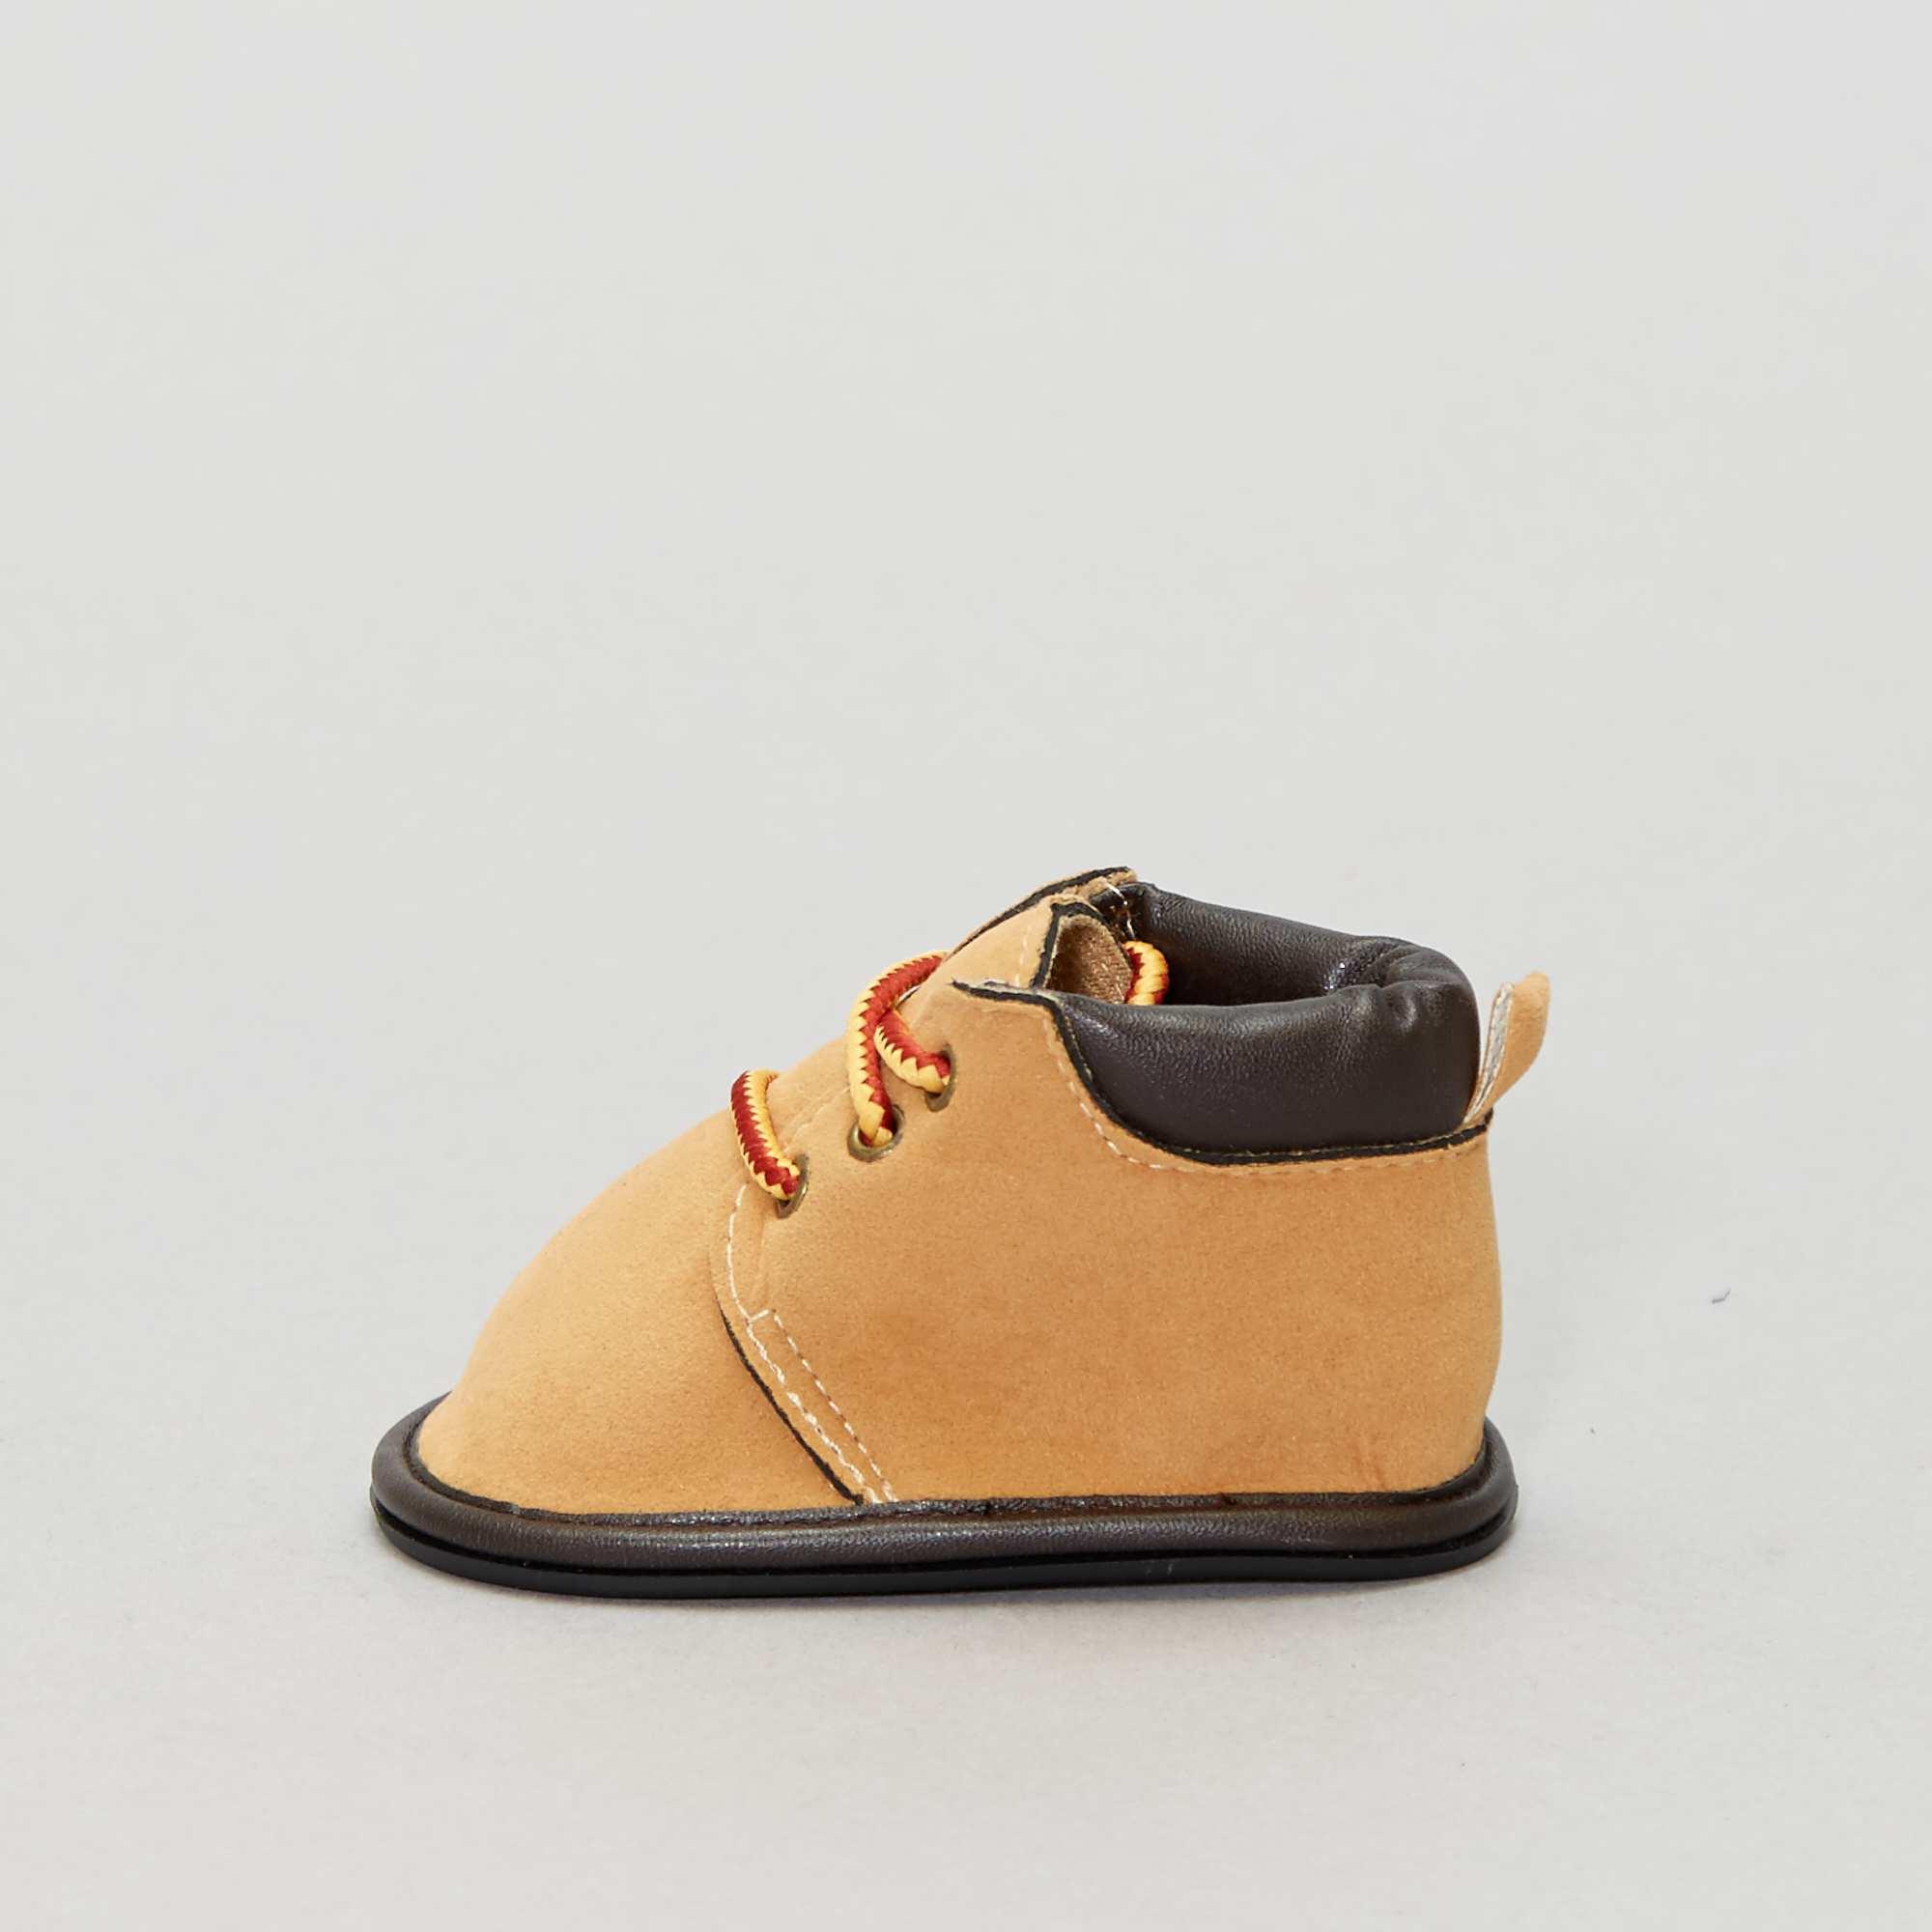 330ea10f5f538 Boots à lacets fantaisies Chaussures - camel - Kiabi - 7